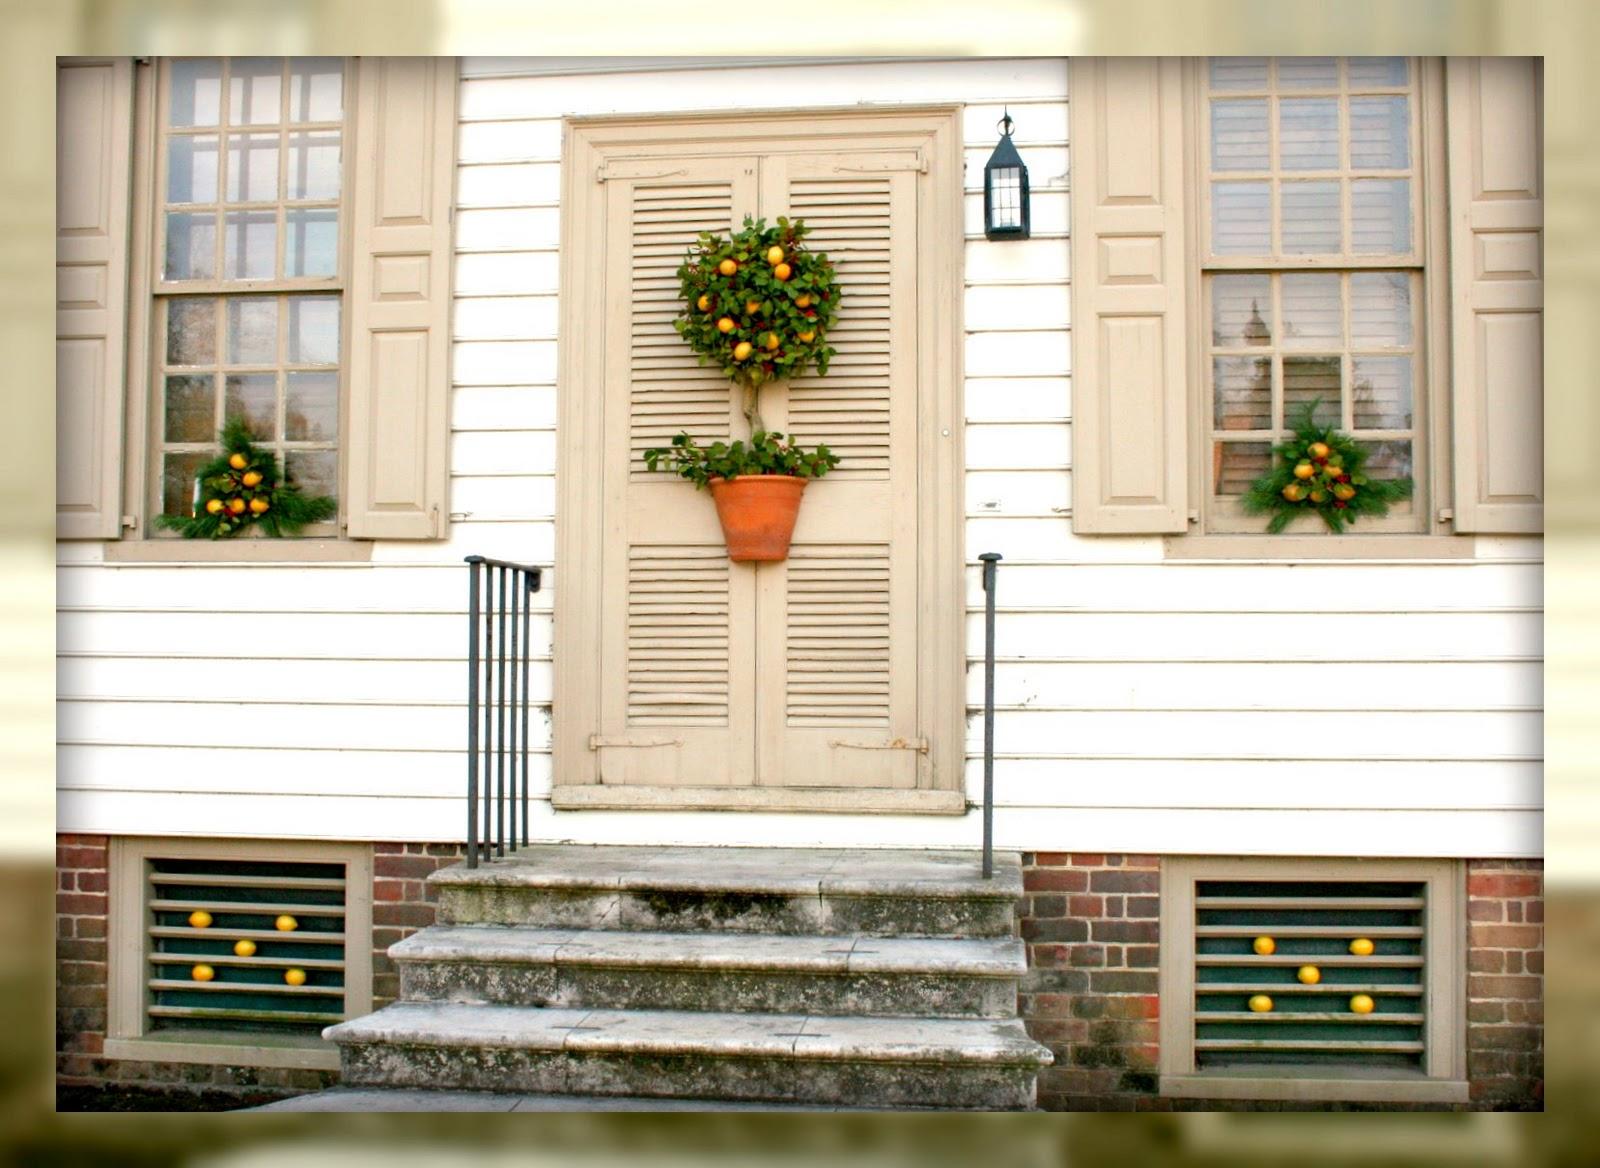 Living In Williamsburg, Virginia: Christmas Topiary ...